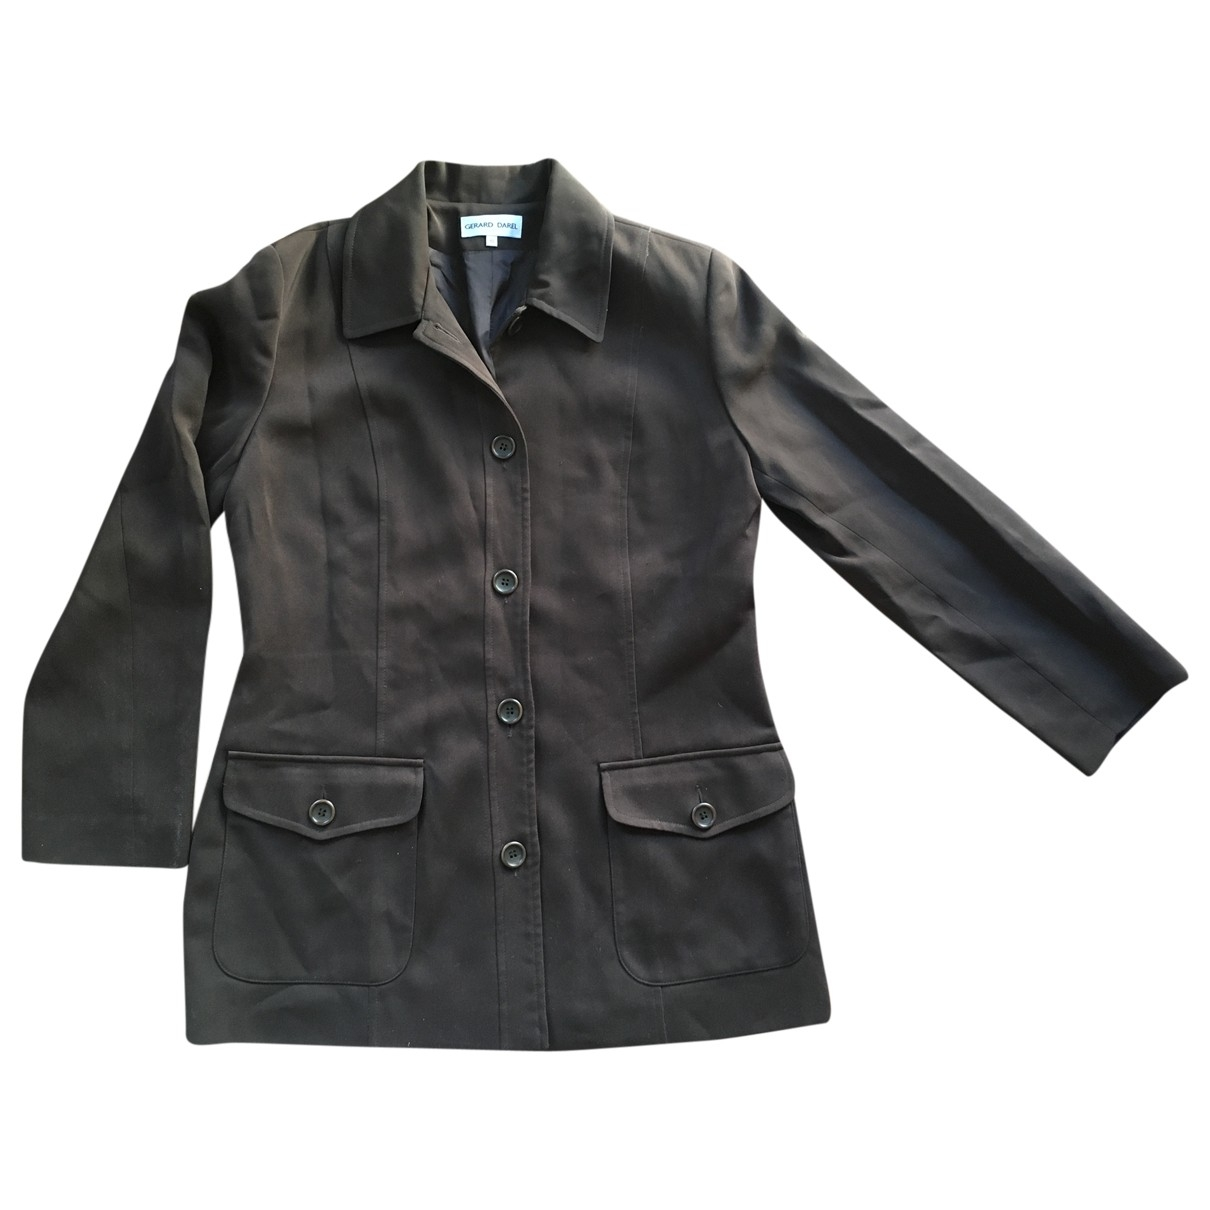 Gerard Darel \N Brown jacket for Women 40 FR